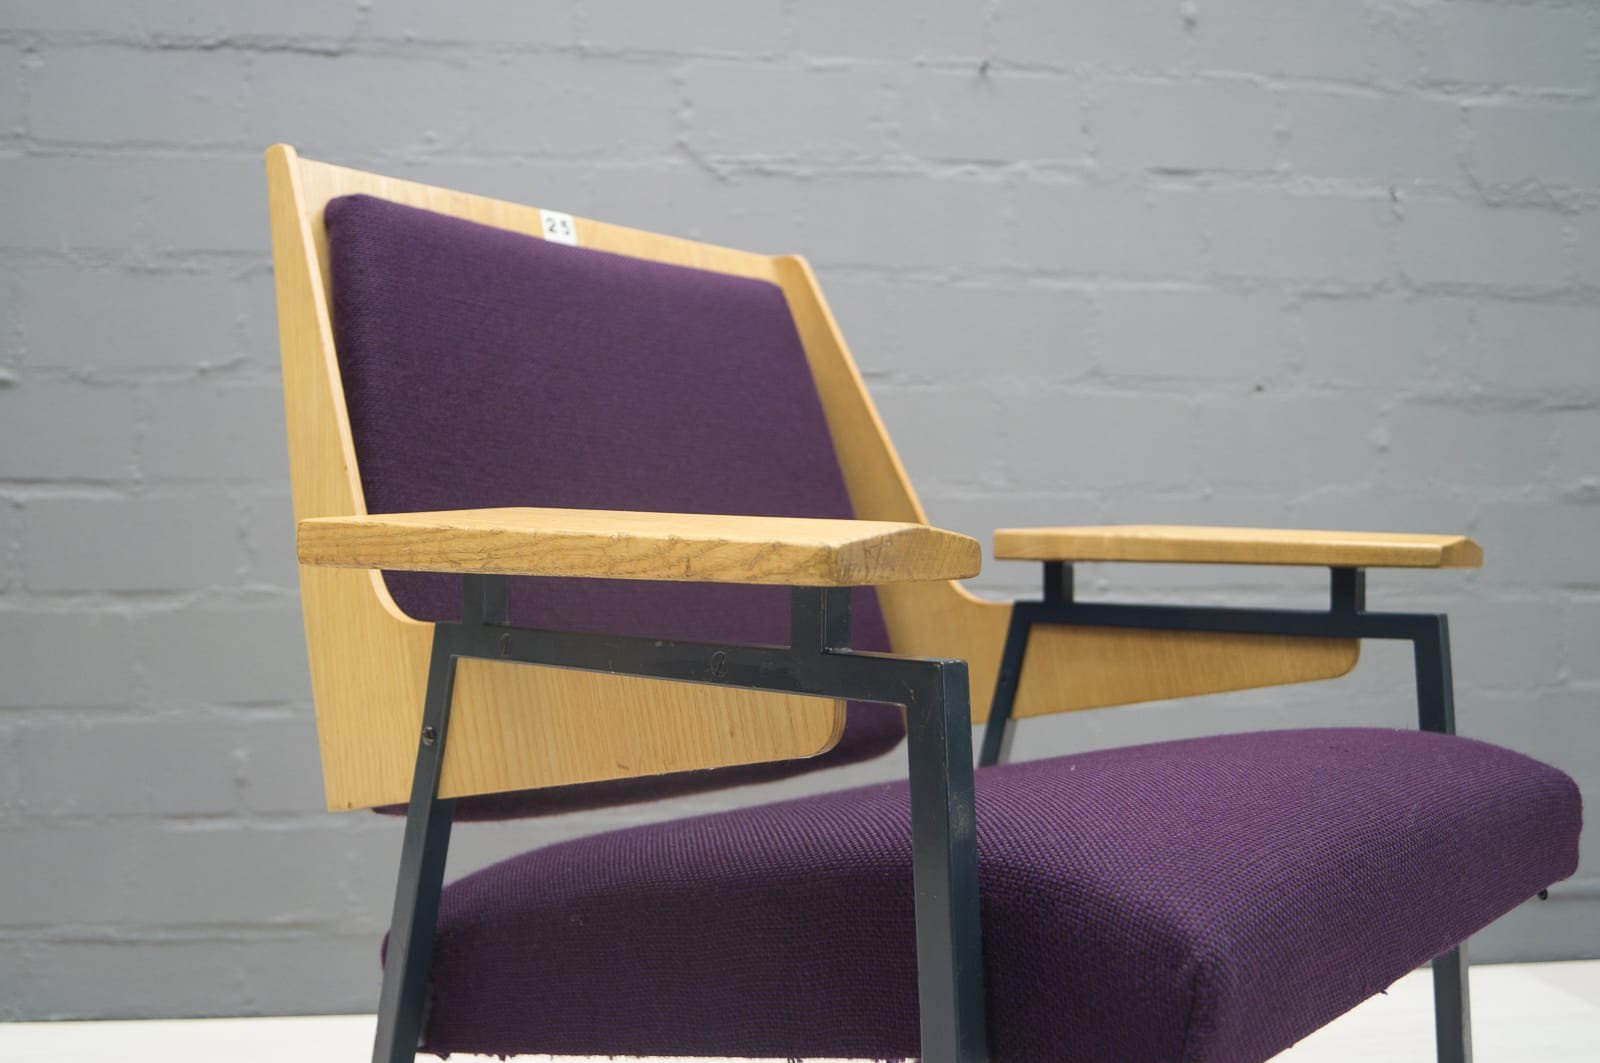 Mid Century Purple Armchair By Wunibald Puchner For The Meistersingerhalle  Nürnberg, 1958